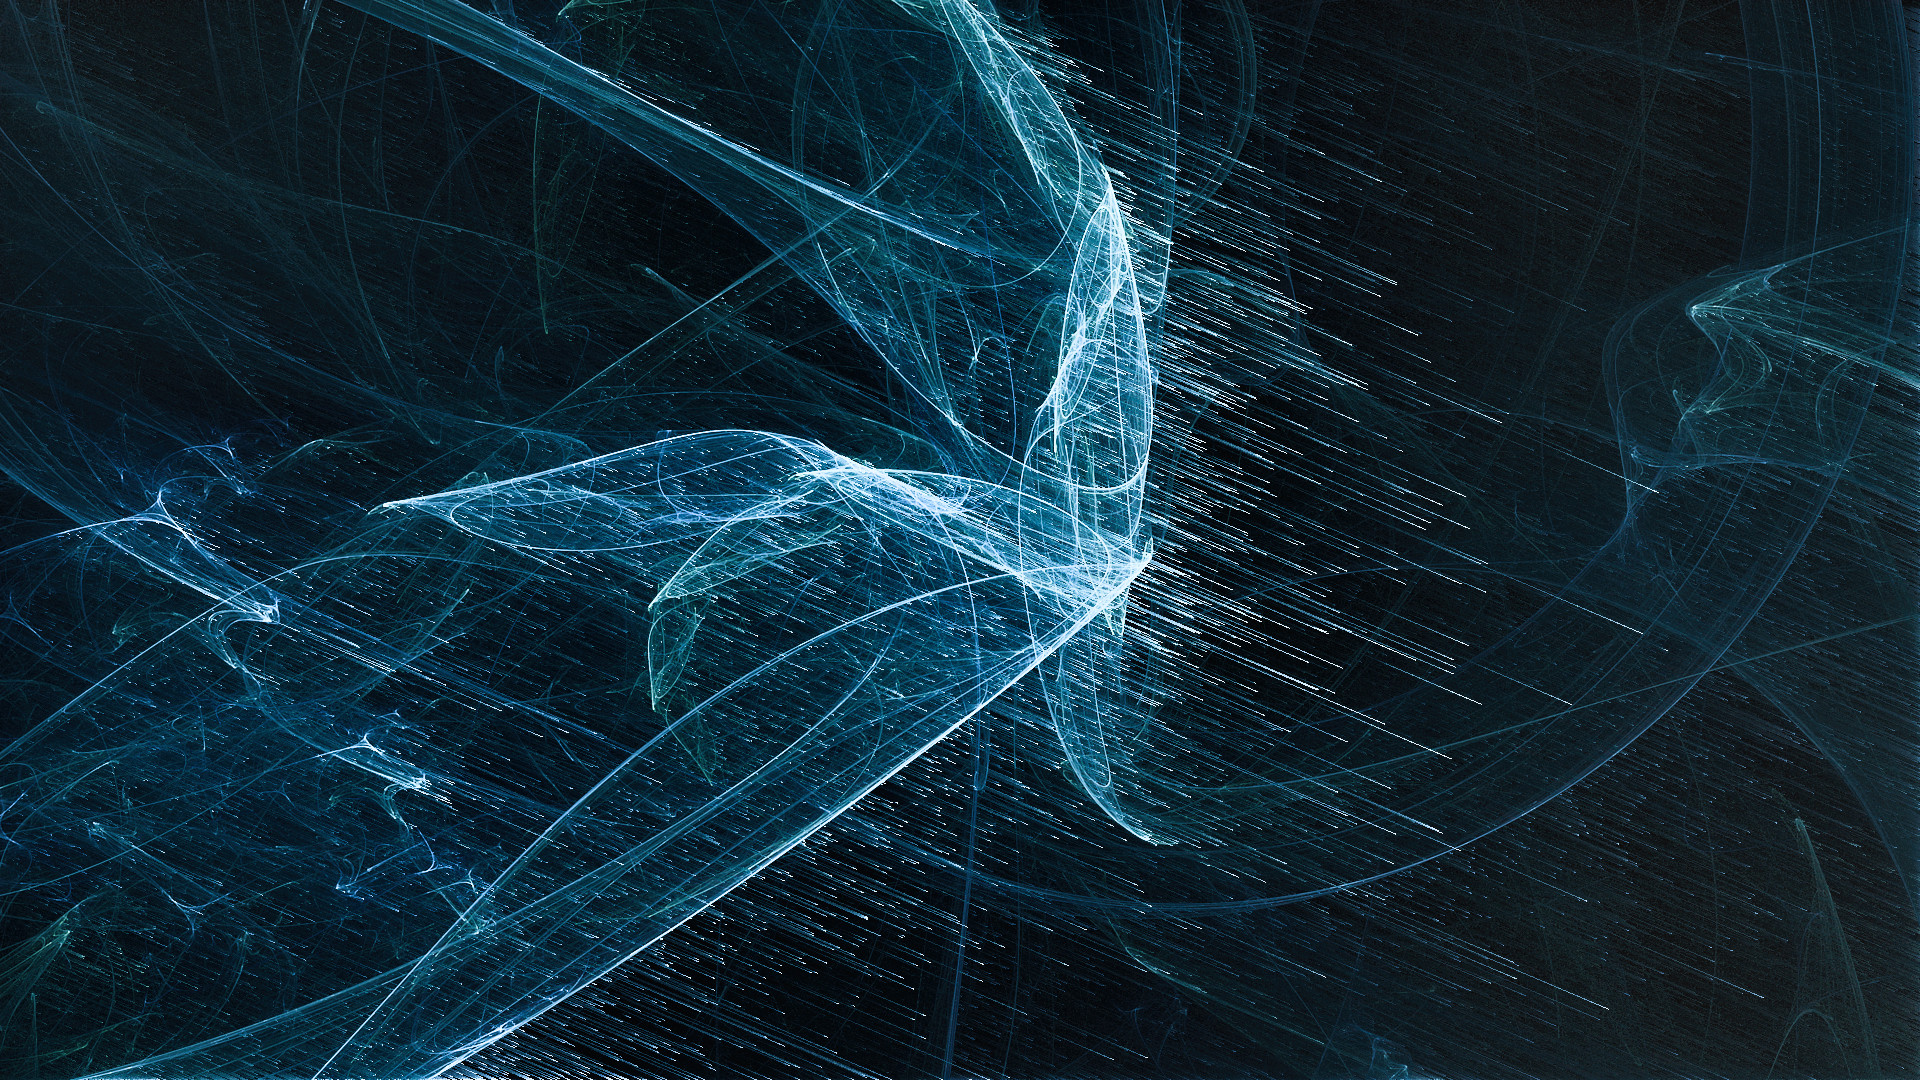 Kresimir jelusic robob3ar fractal rain 8